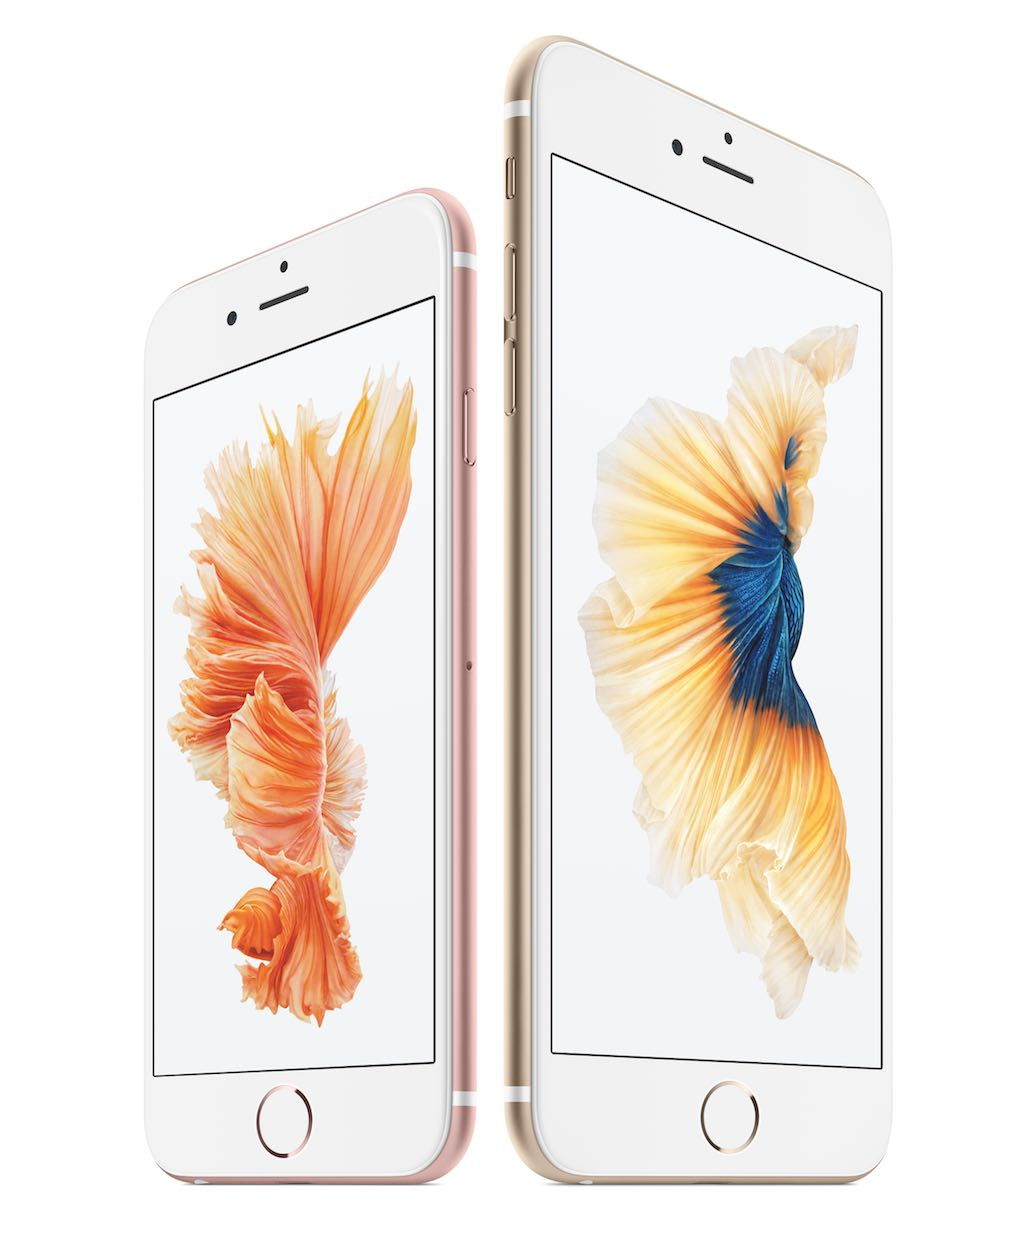 iPhone 6s Plus 16GBを買うぐらいなら、iPhone 6s 64GBを買うべきだ